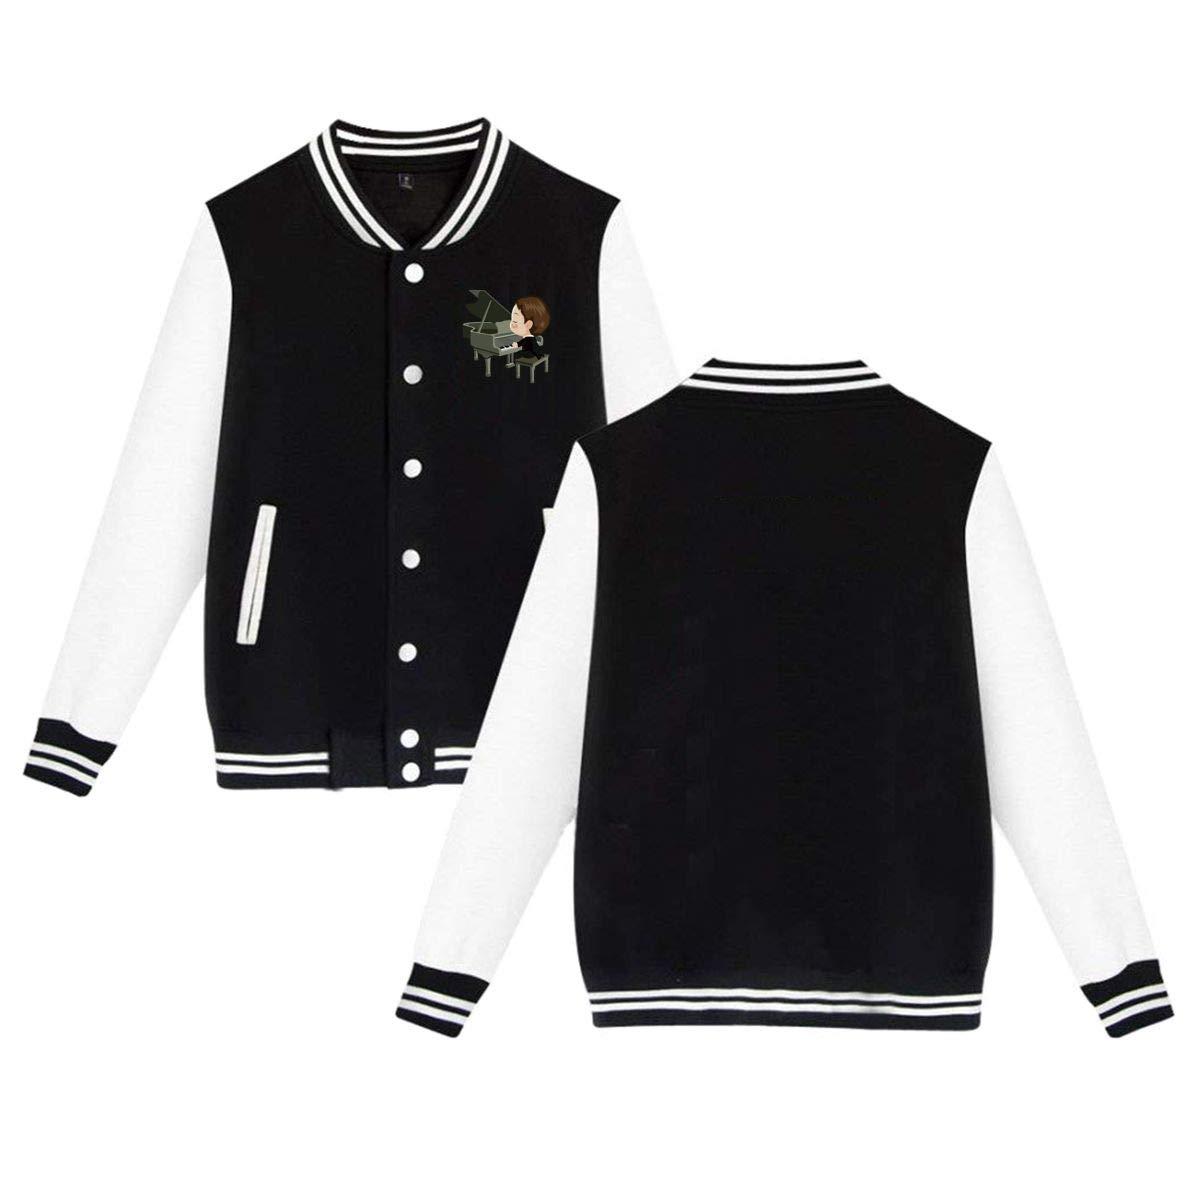 Mcdisjh.greioh Freddie Mercury Peanuts Playing Piano Baseball Uniform Jacket Unisex Coat Sweater Sweatshirt